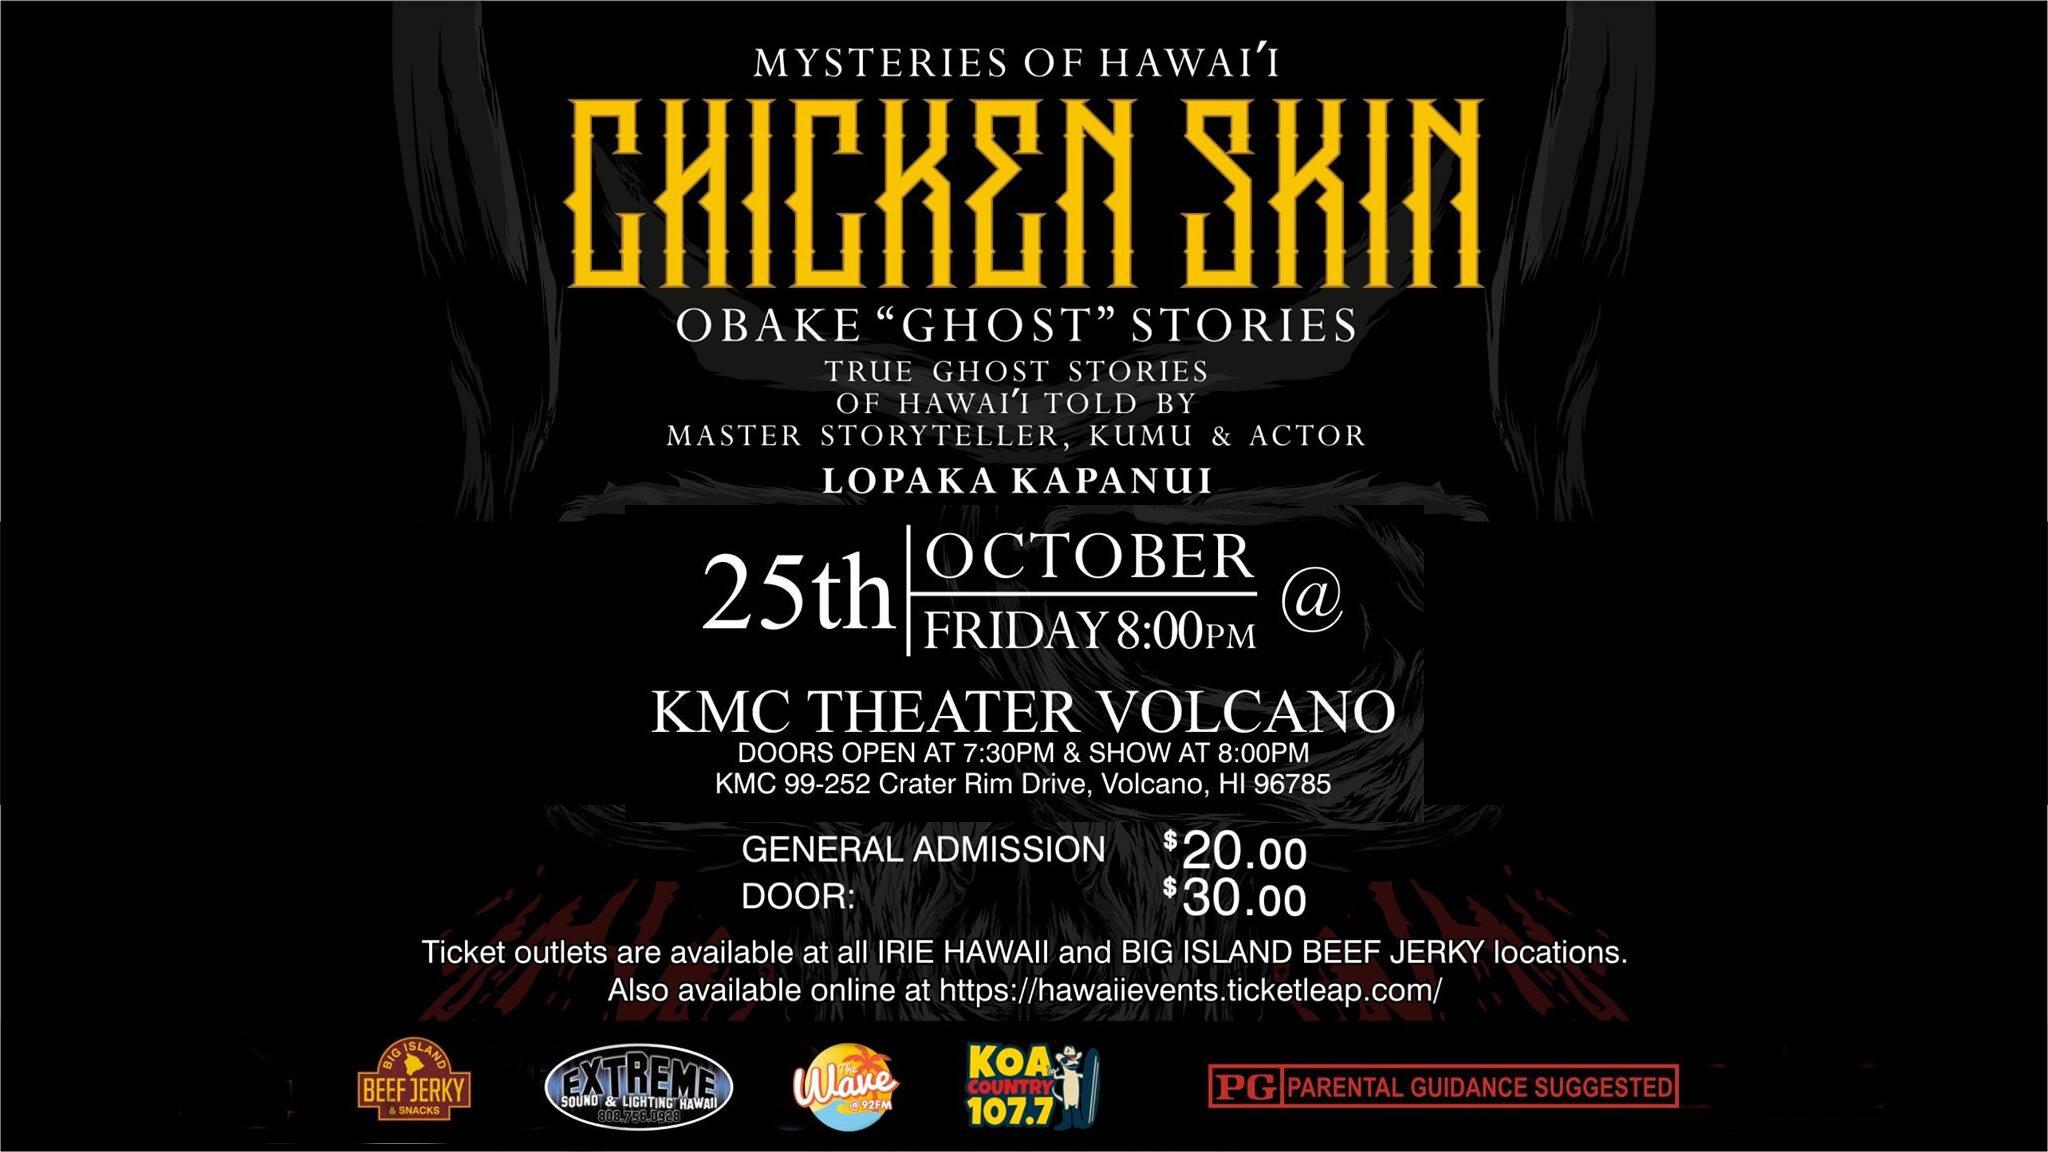 Chicken Skin Obake Ghost Stories KMC Theater Volcano